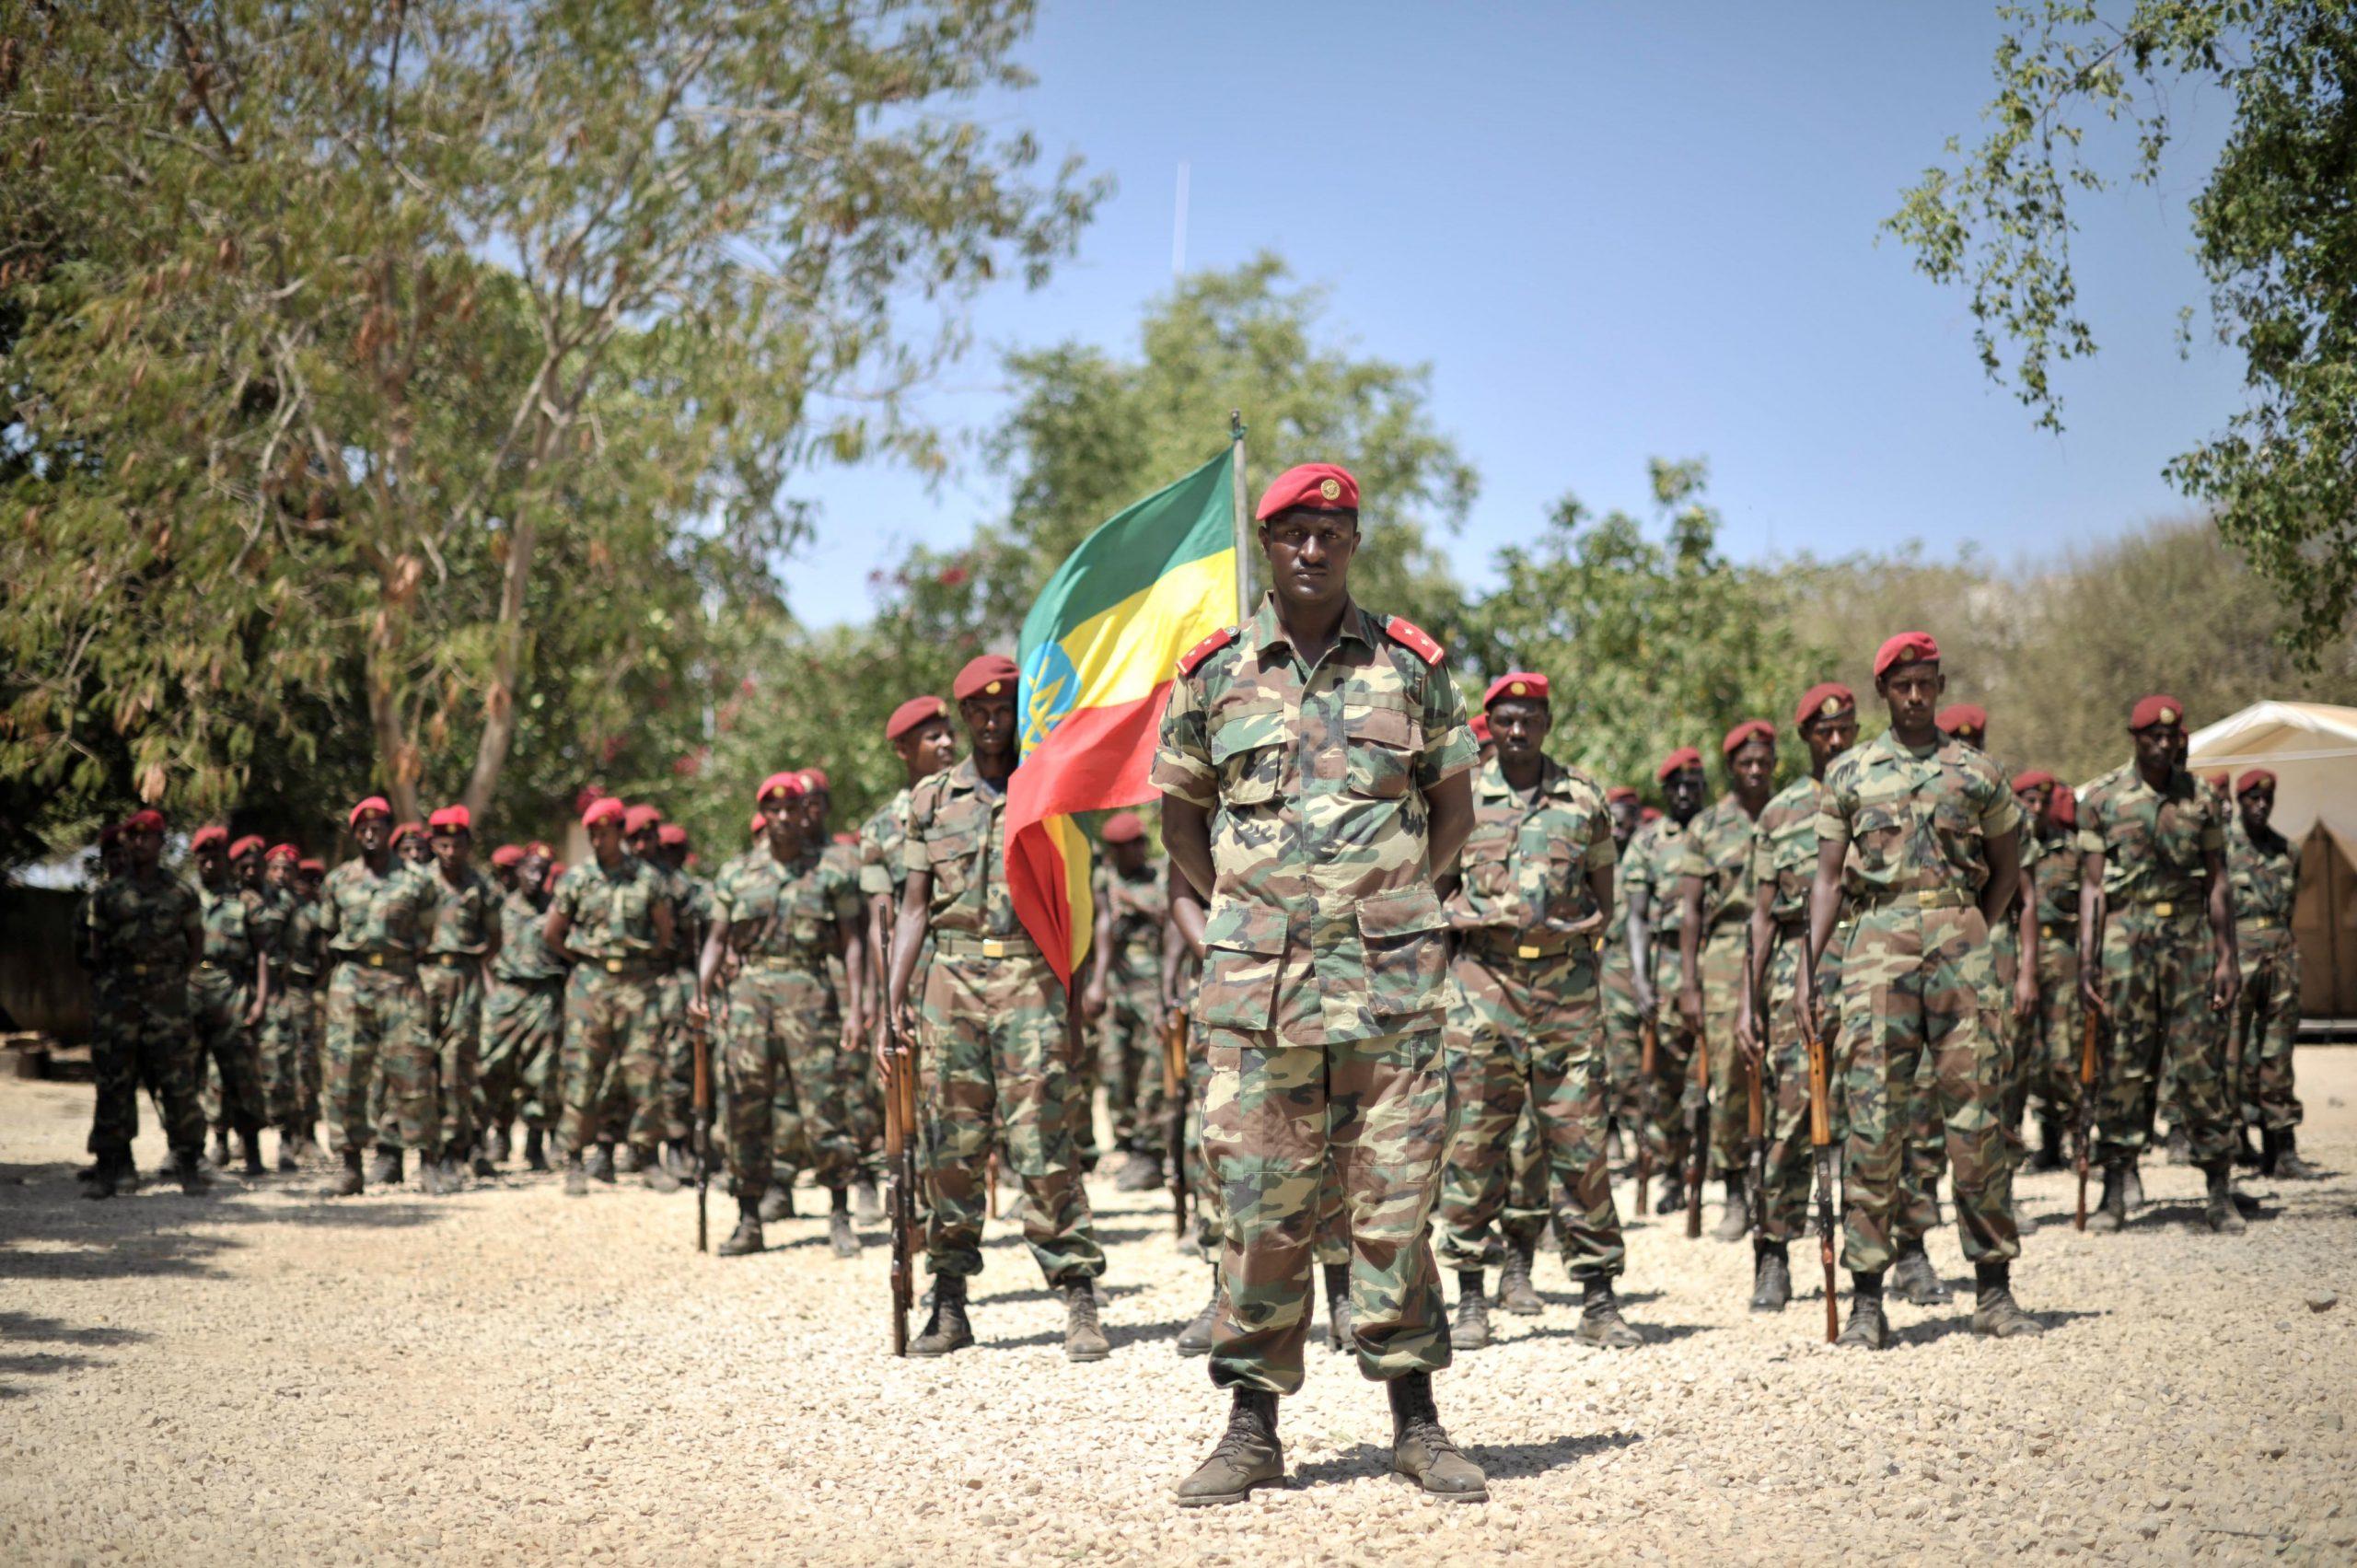 https://www.atlanticcouncil.org/wp-content/uploads/2020/11/Ethiopia-scaled.jpg